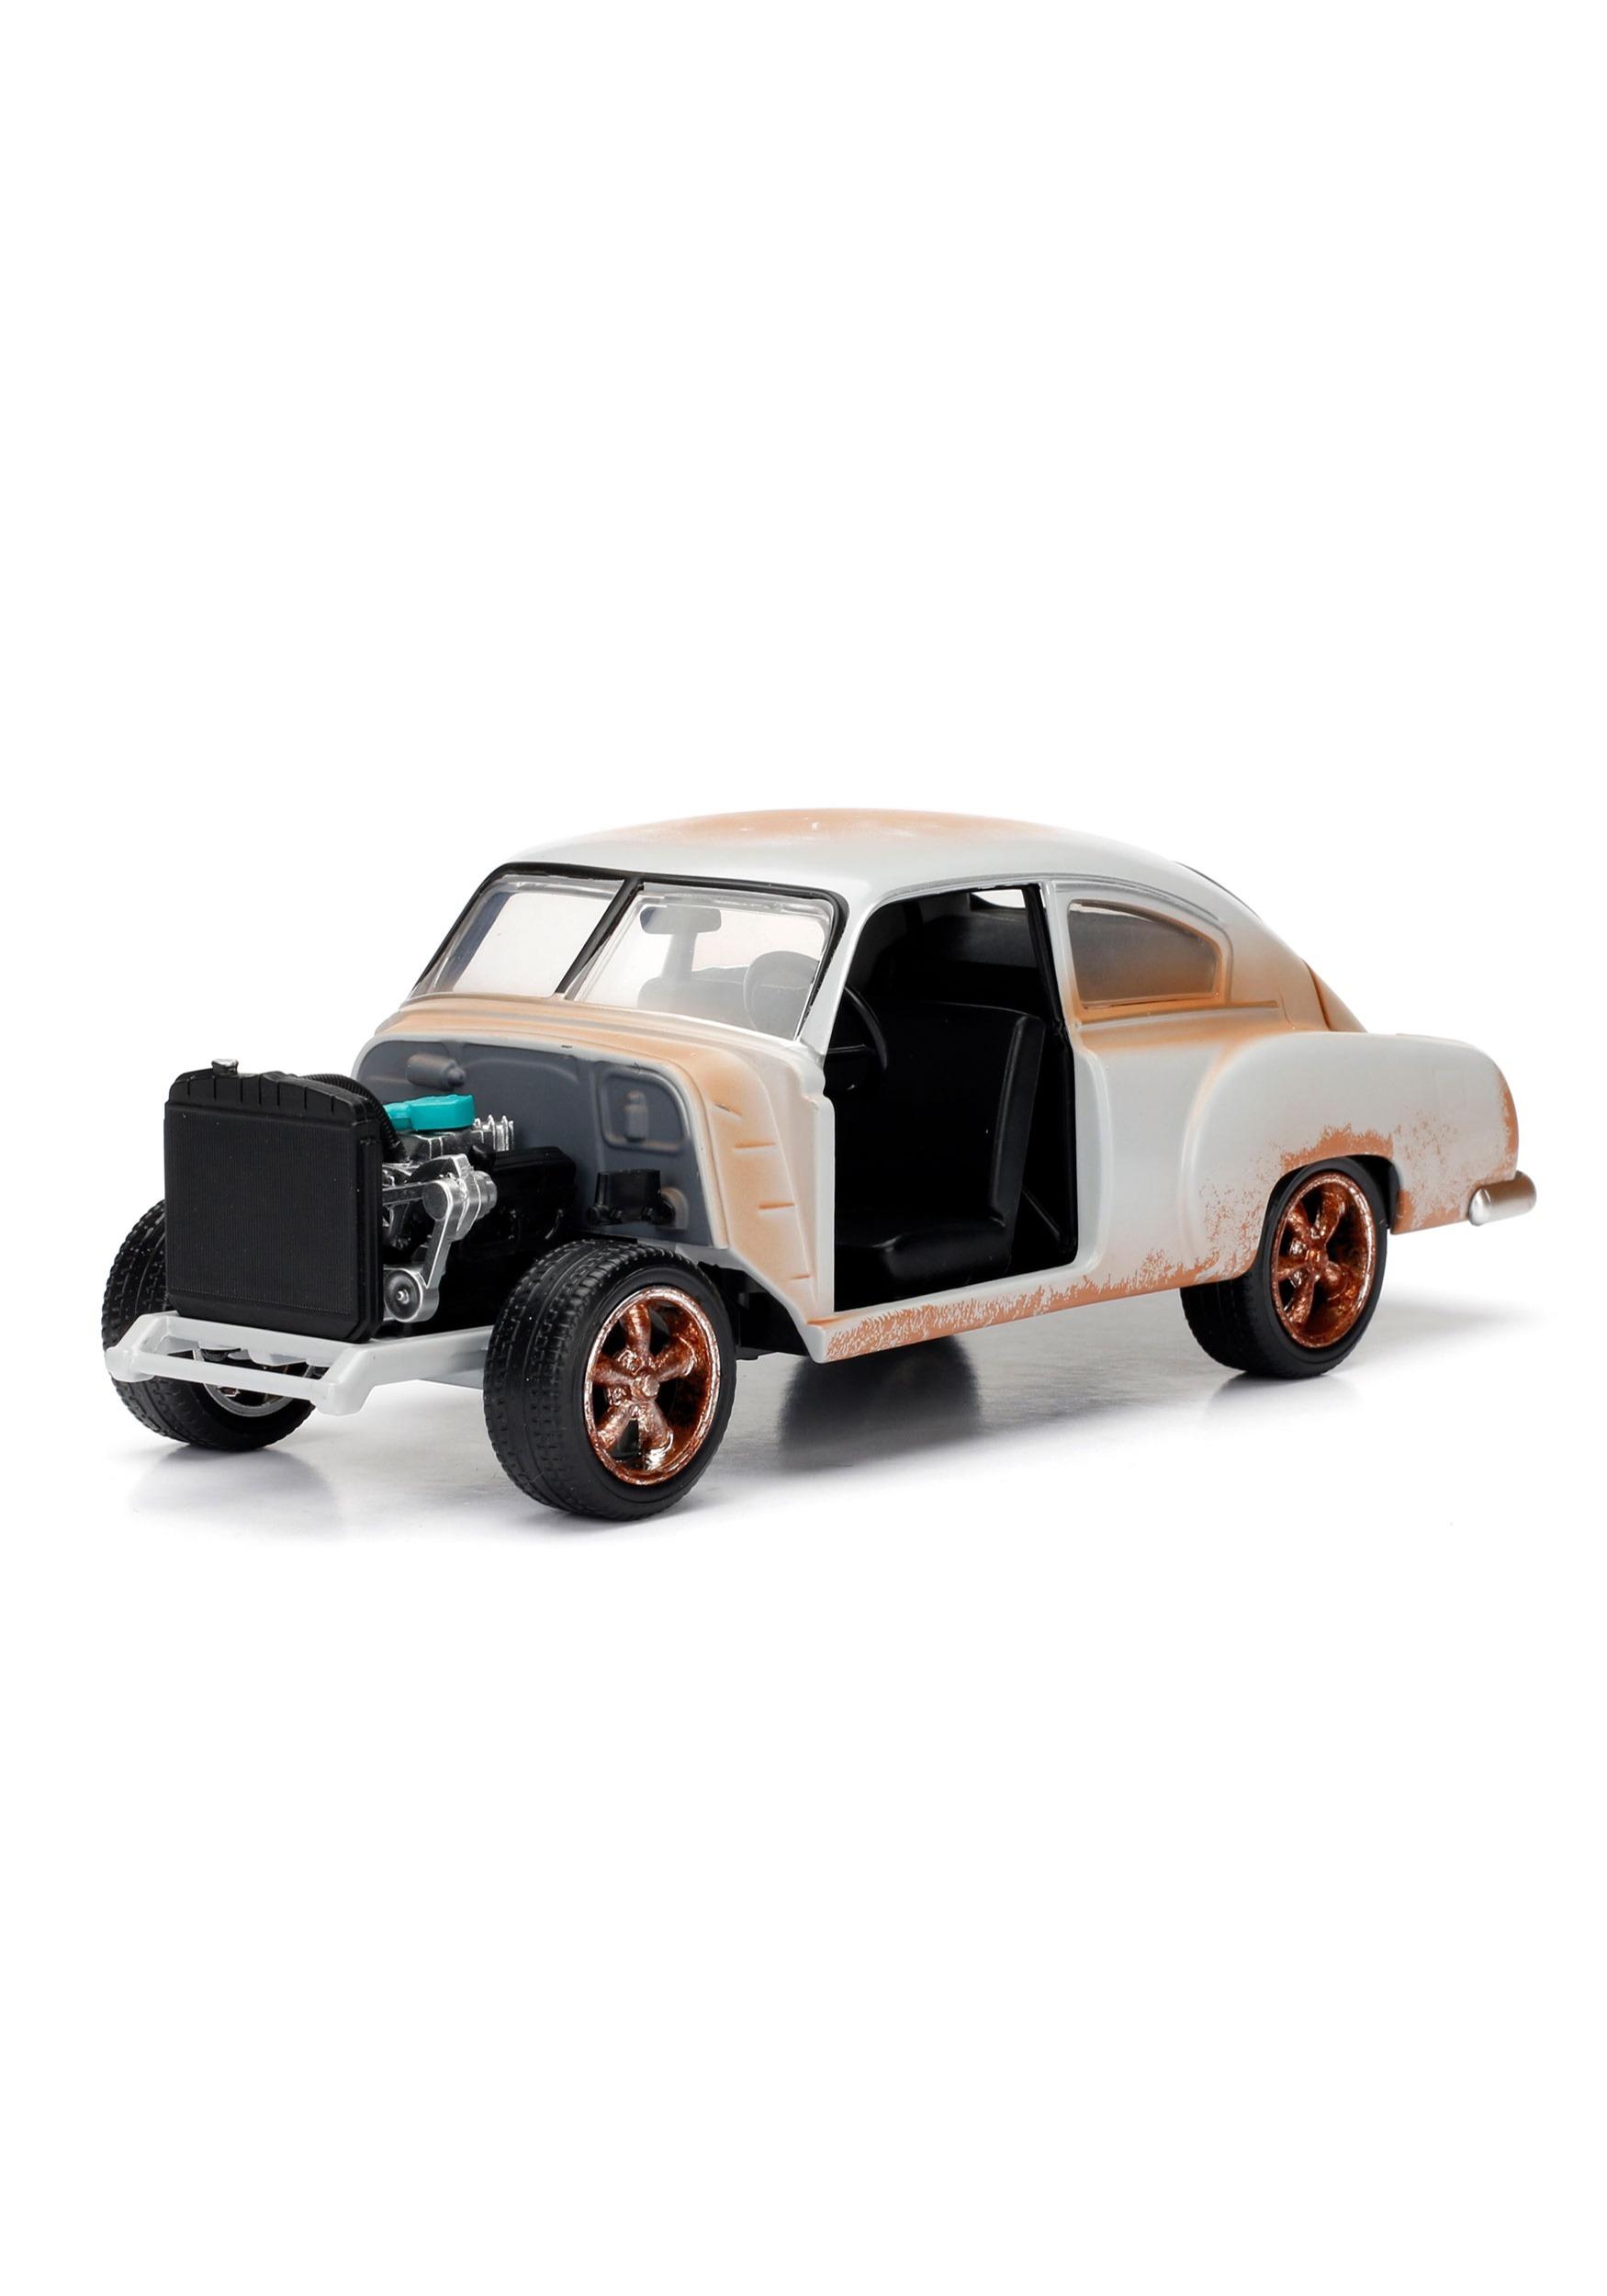 '58 Chevy Fleetline Fast & the Furious